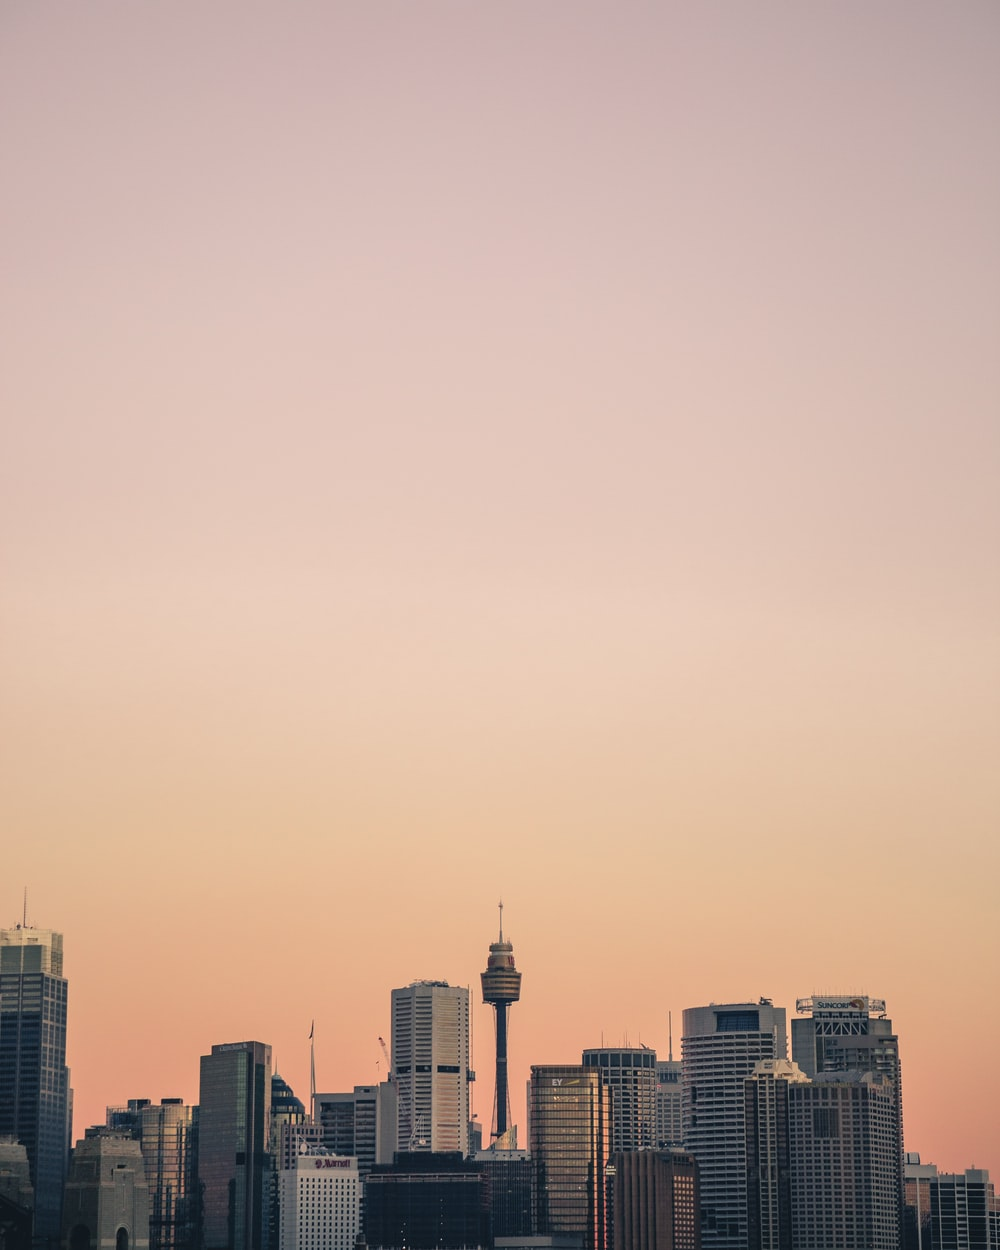 high rise building under orange skies